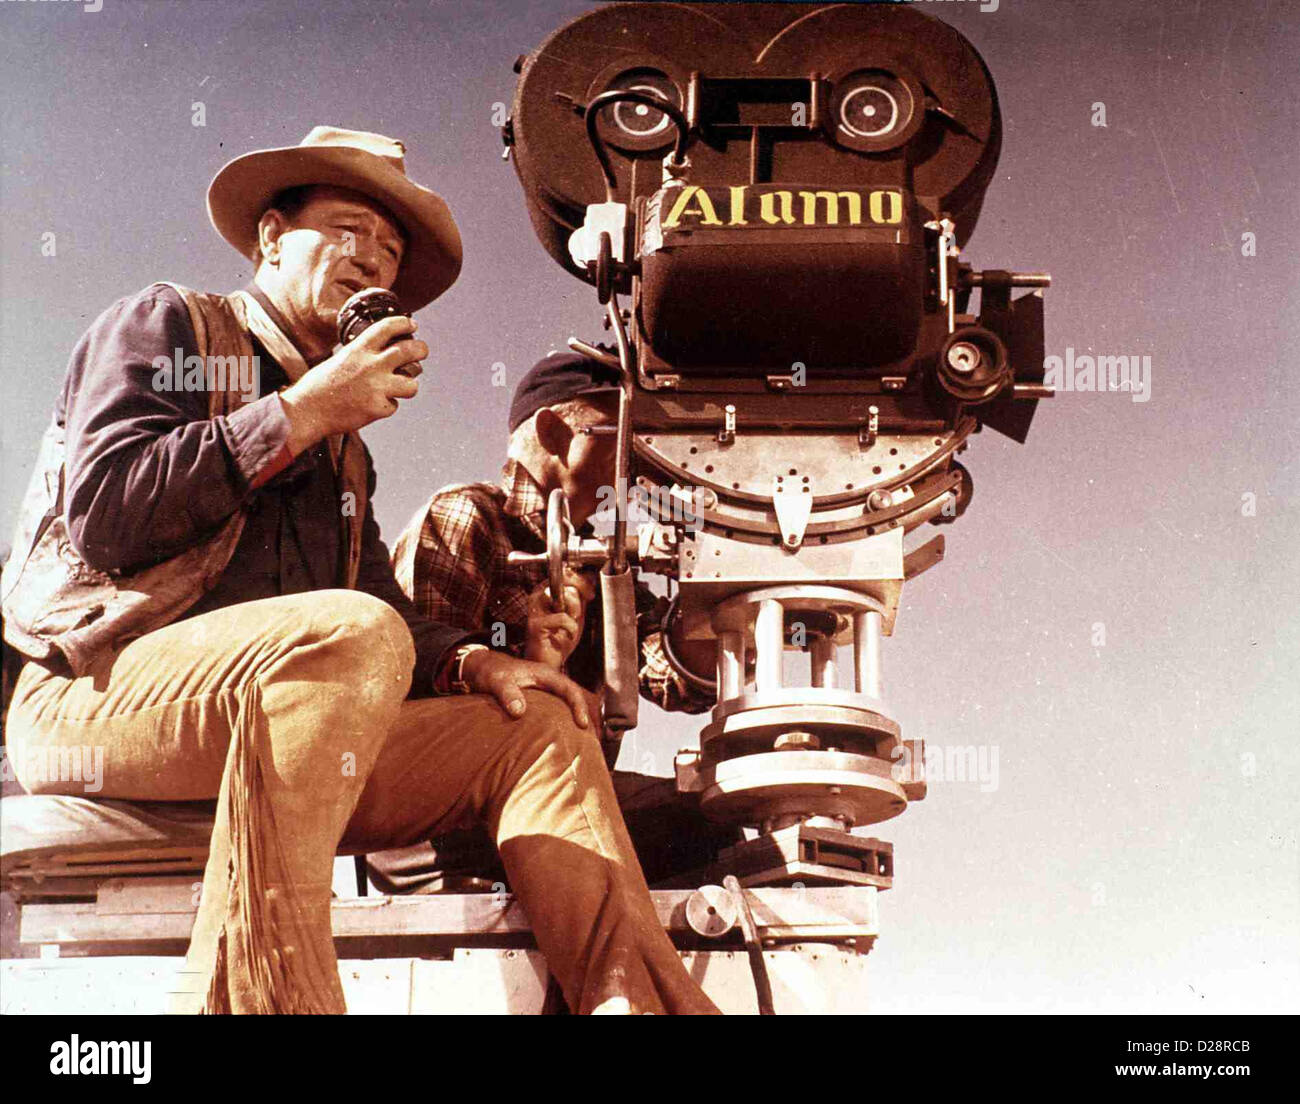 John Wayne - Ein Porträt Von James Kent   Wayne, John    *** Local Caption *** 0  -- - Stock Image